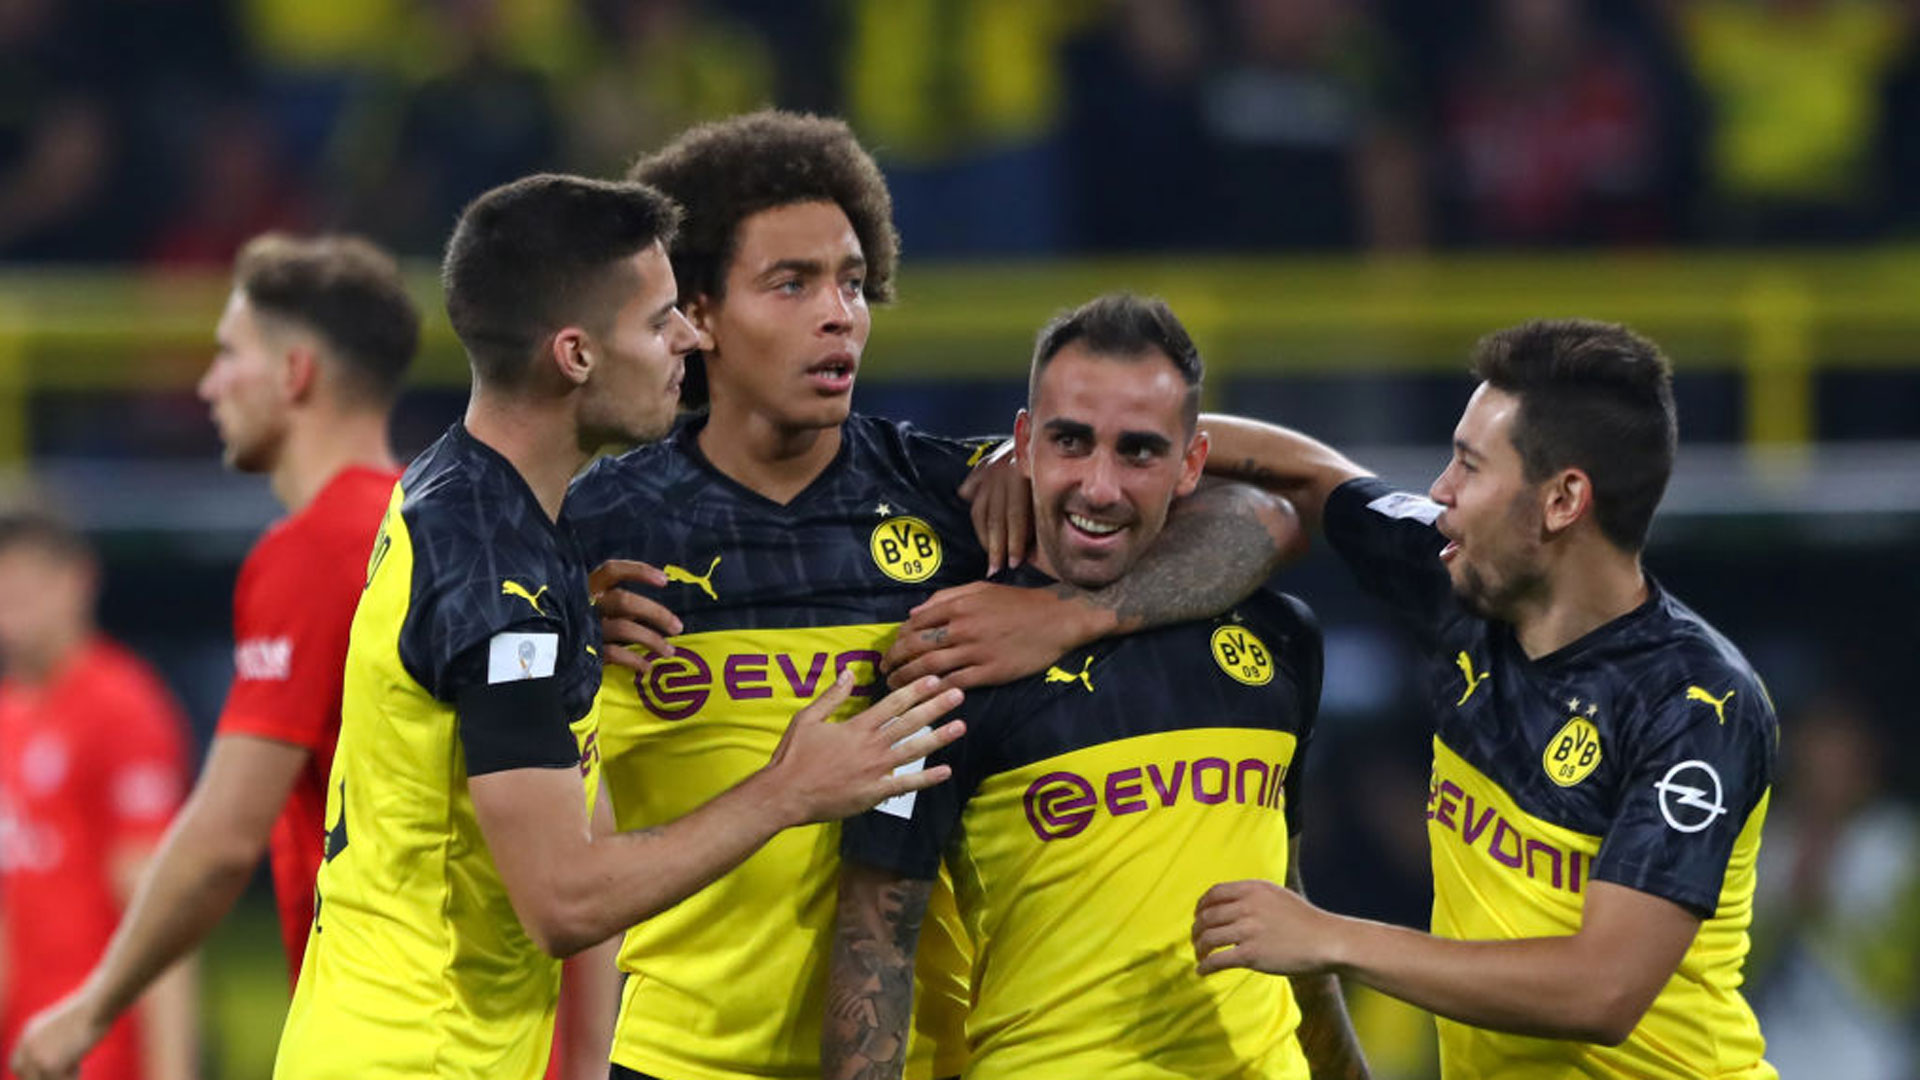 Borussia Dortmund - Bayern Munich (2-0) - Le Borussia s'adjuge la Supercoupe